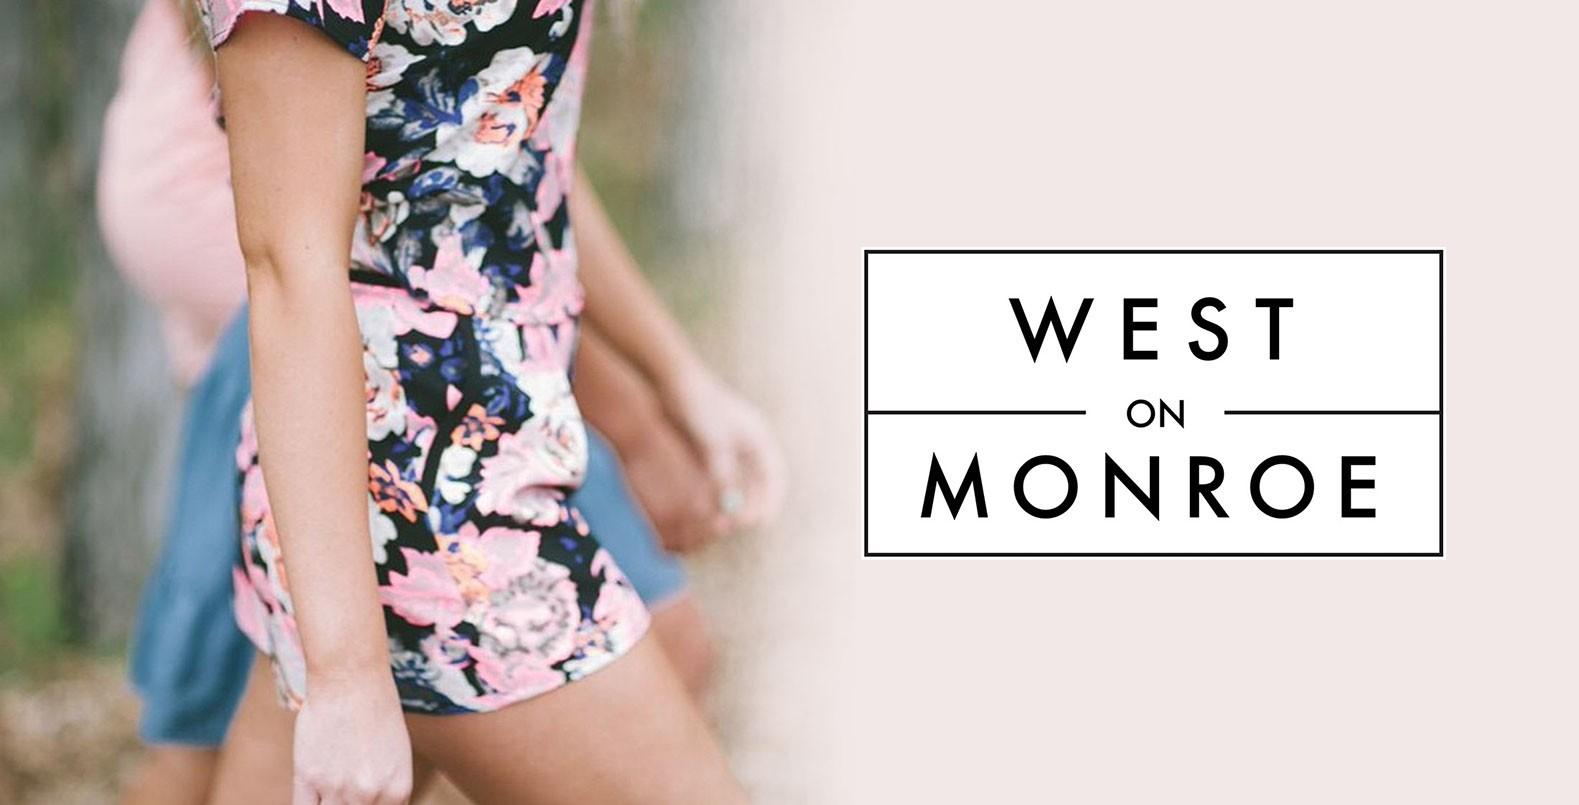 West on Monroe, a clean modern logo design for a fashion brand